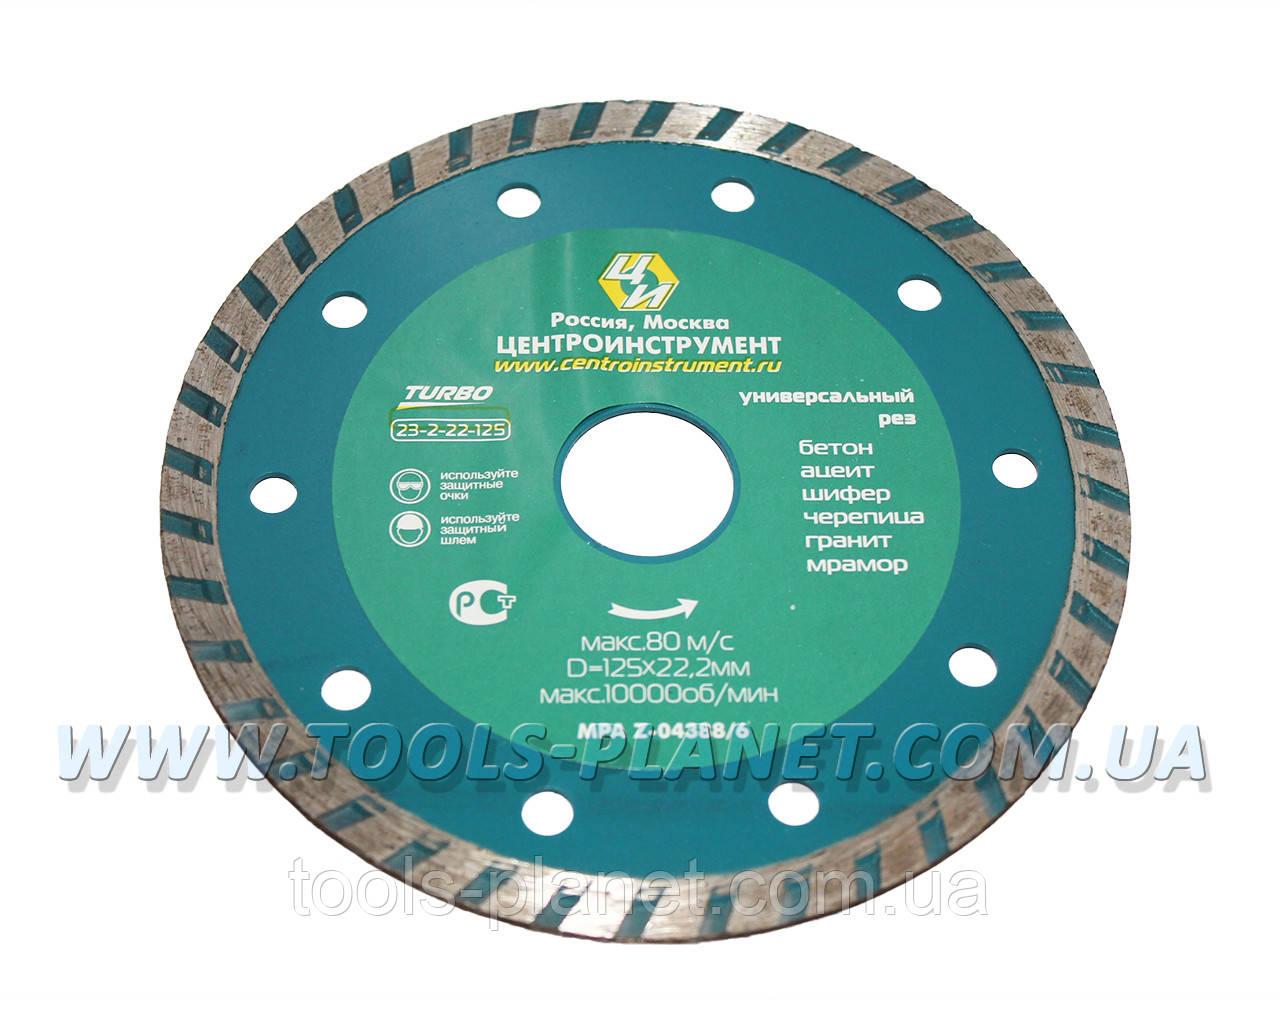 Алмазный диск Центроинструмент 125 х 7 х 22,23 Турбо